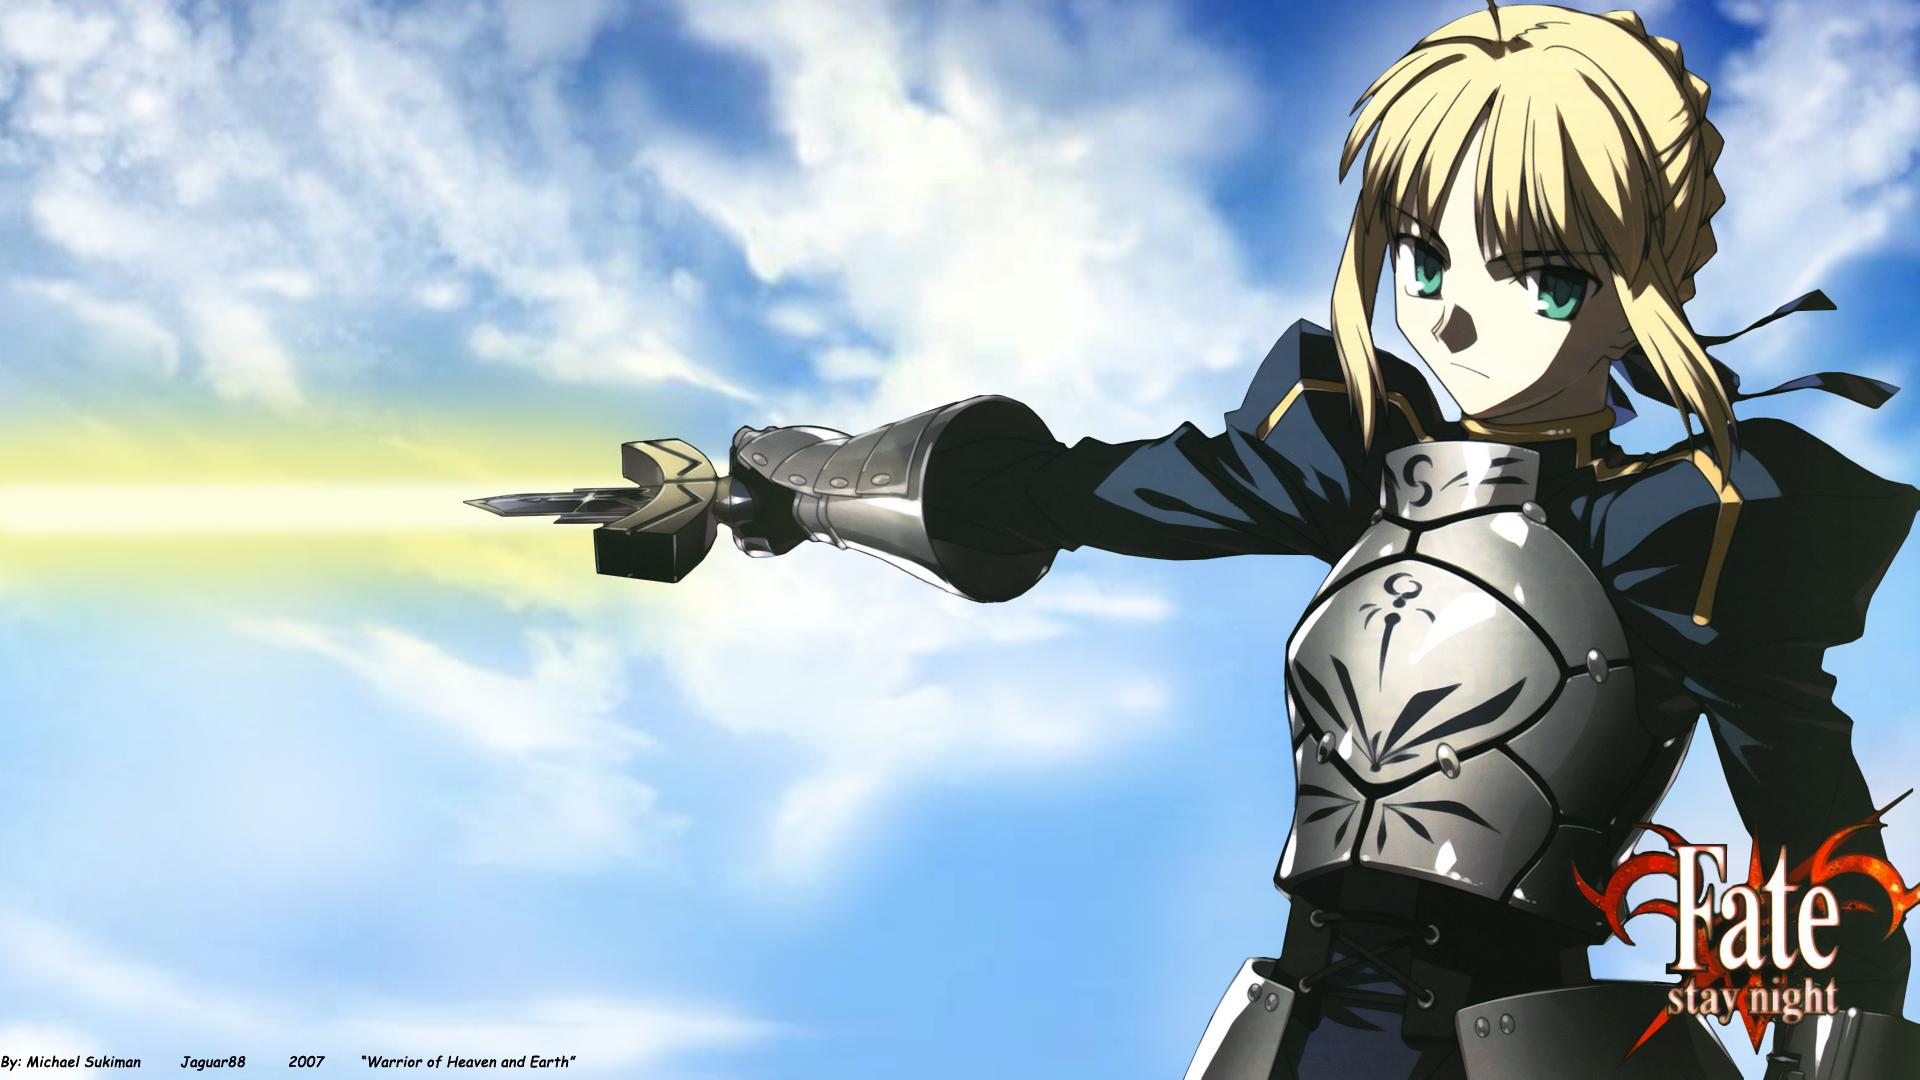 artoria_pendragon_(all) fate_(series) fate/stay_night saber sword weapon